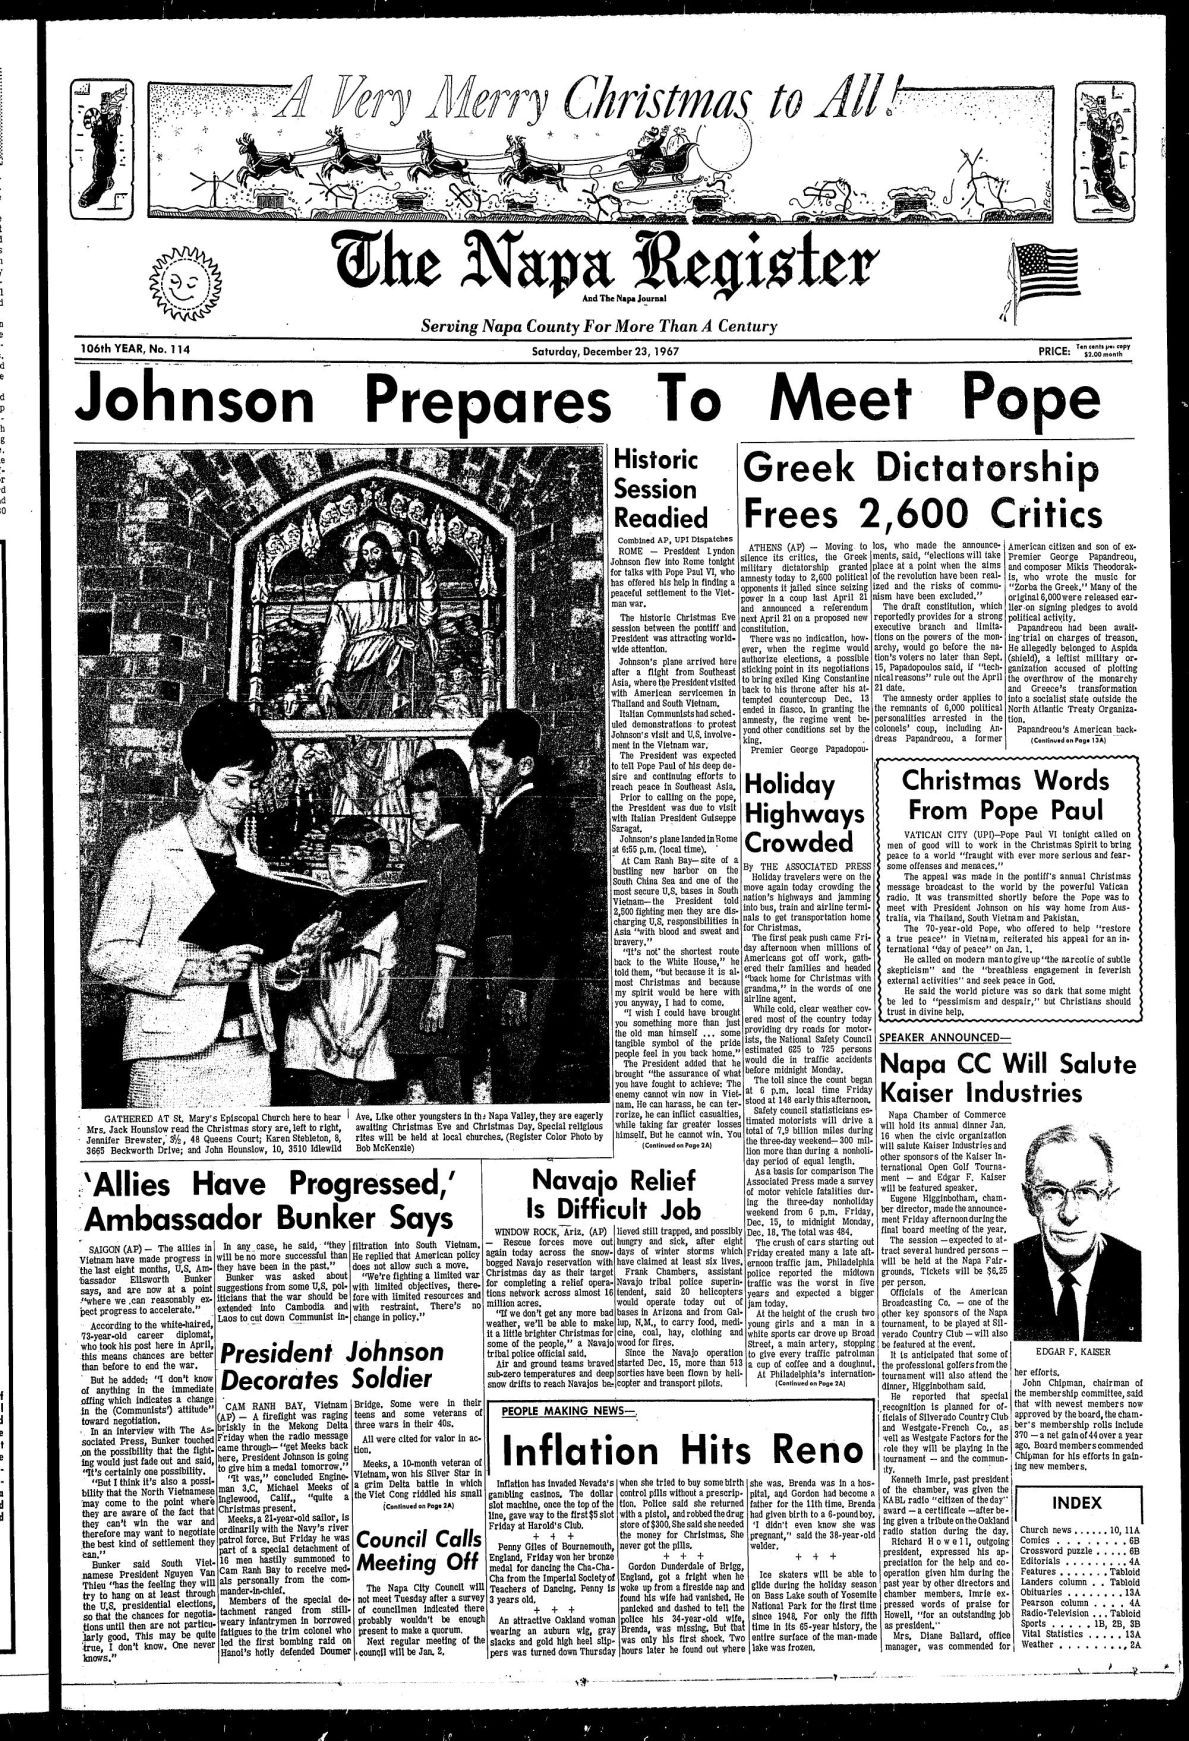 Dec. 23, 1967